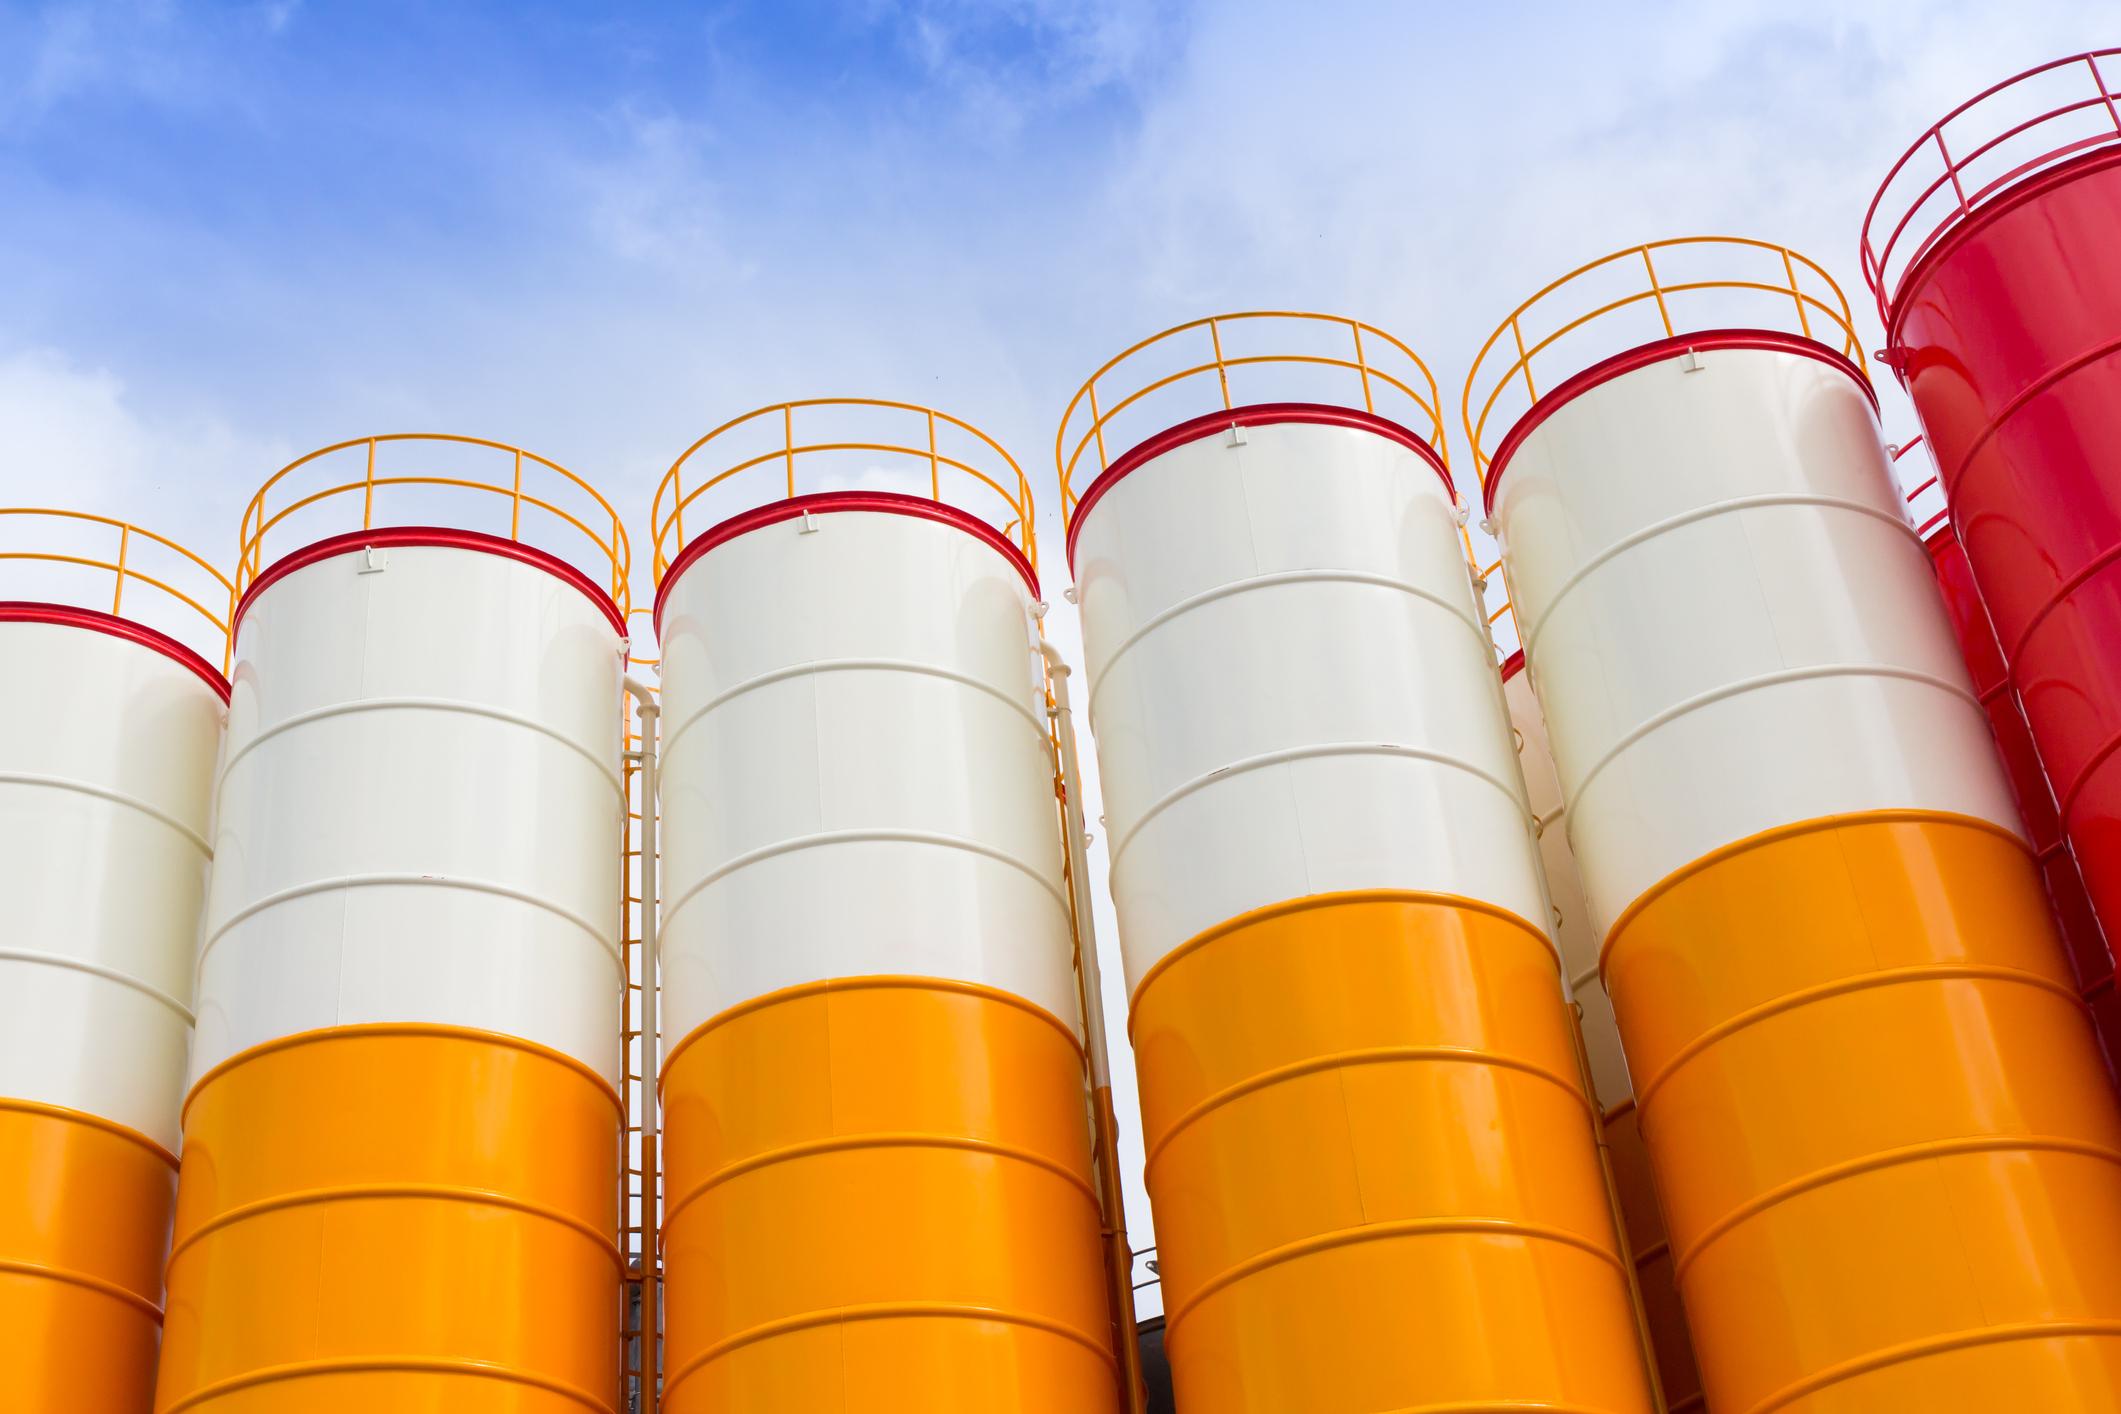 Row of farm silos representing cross-silo leadership and horizontal collaboration